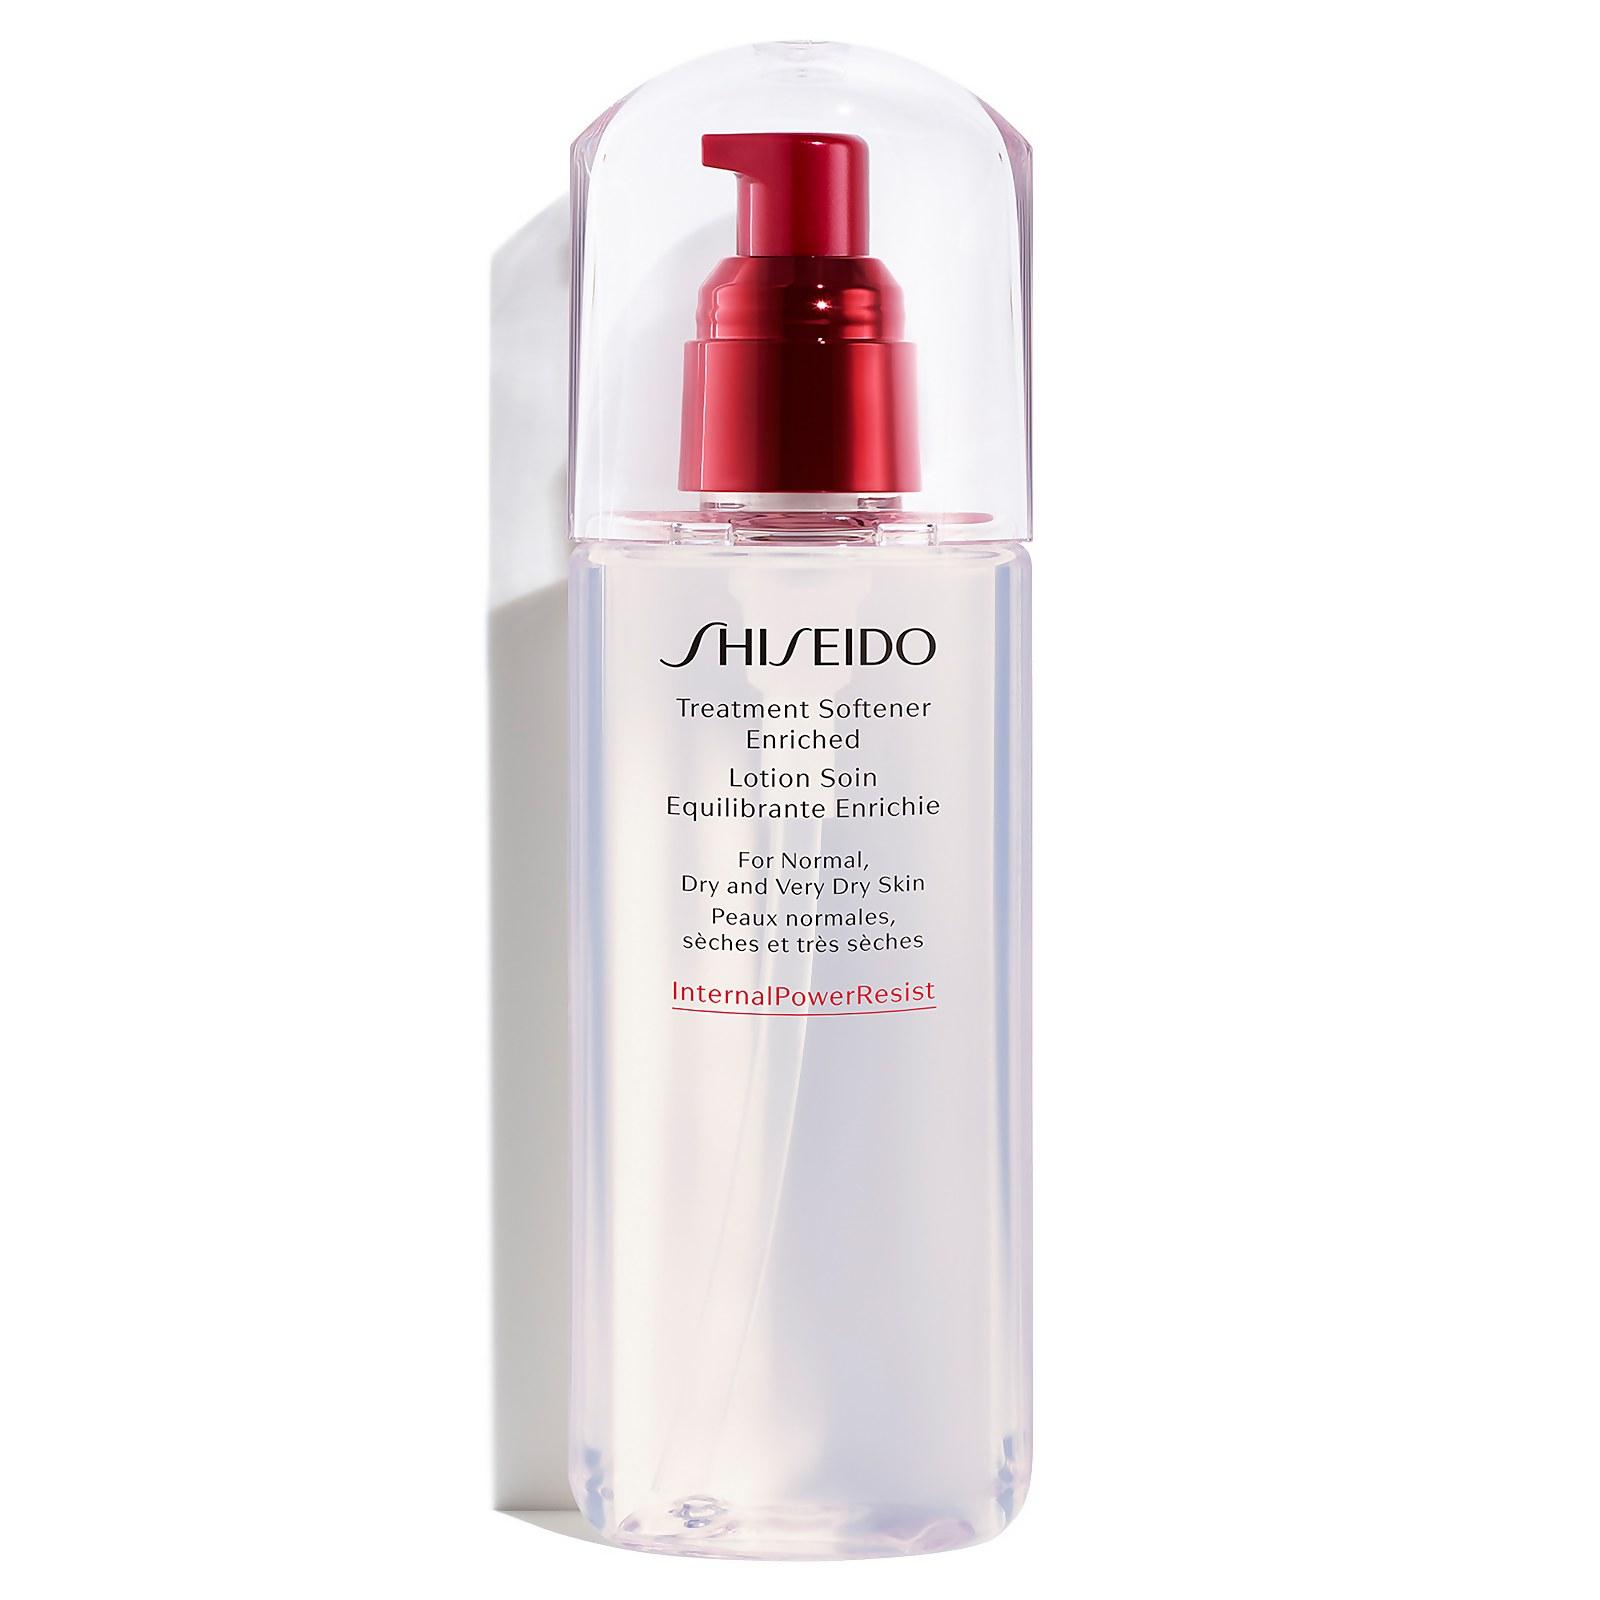 Купить Shiseido Treatment Softener Enriched 150ml